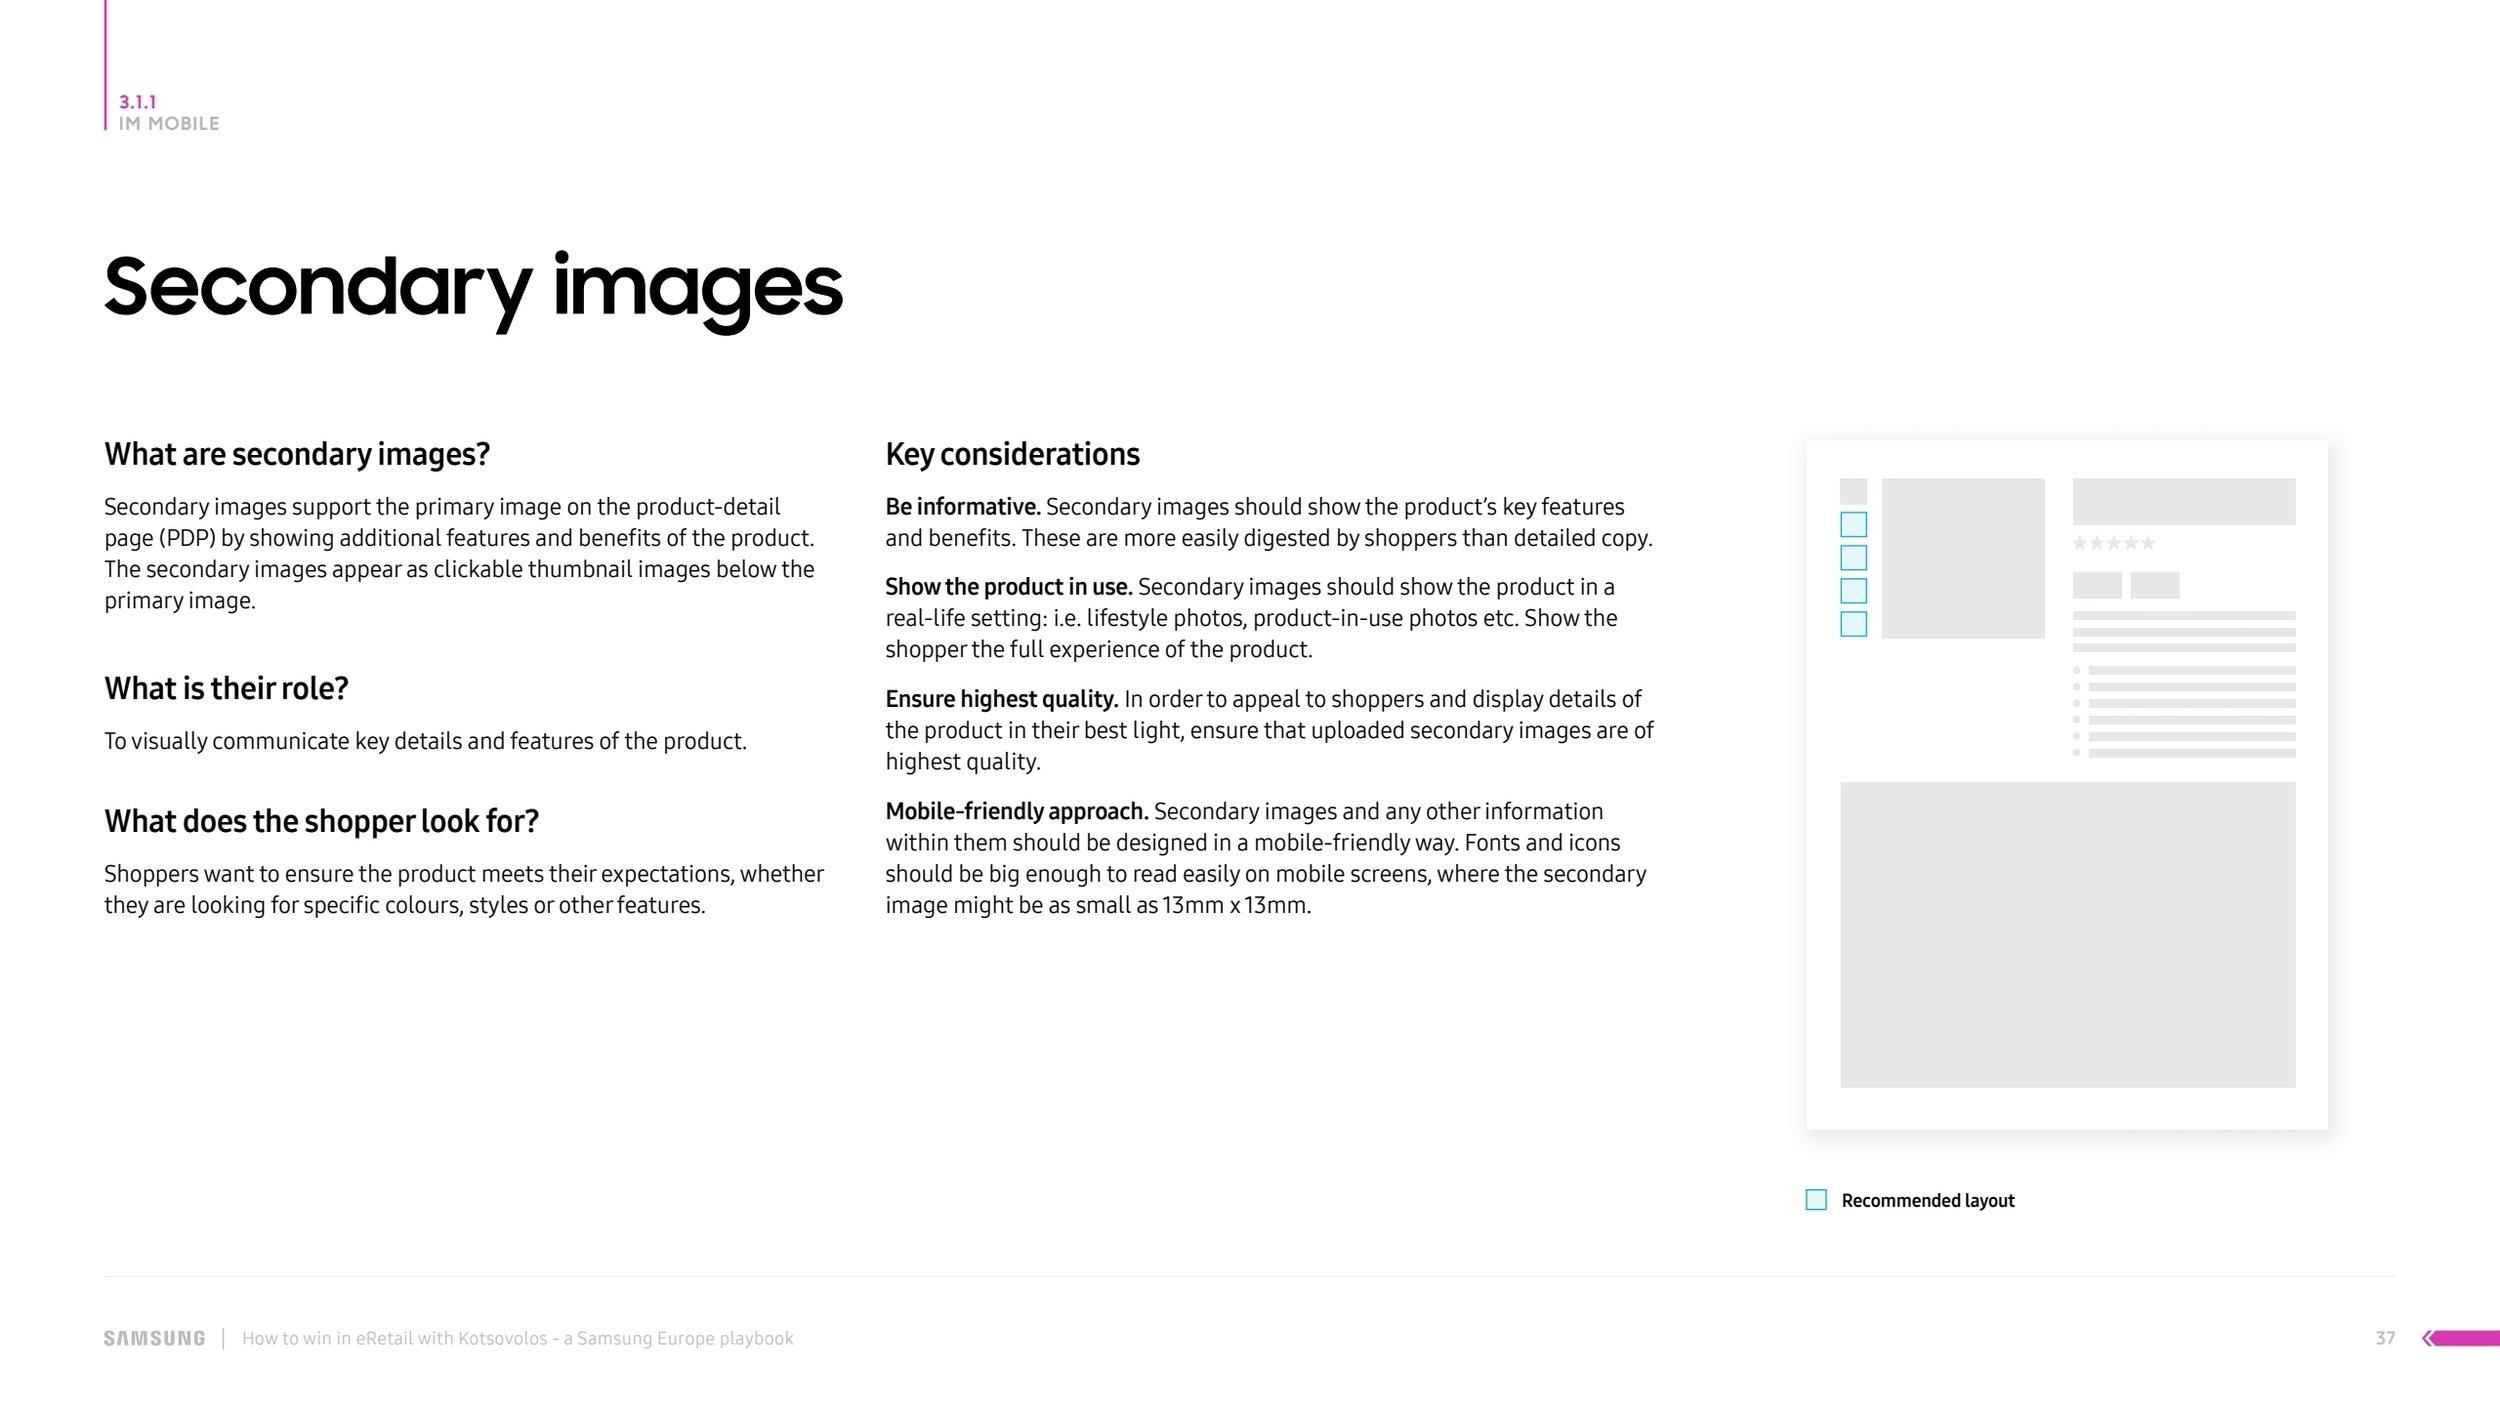 Samsung_Playbook_Kotsovolos_009-AG-PORTFOLIO_page_17.jpg